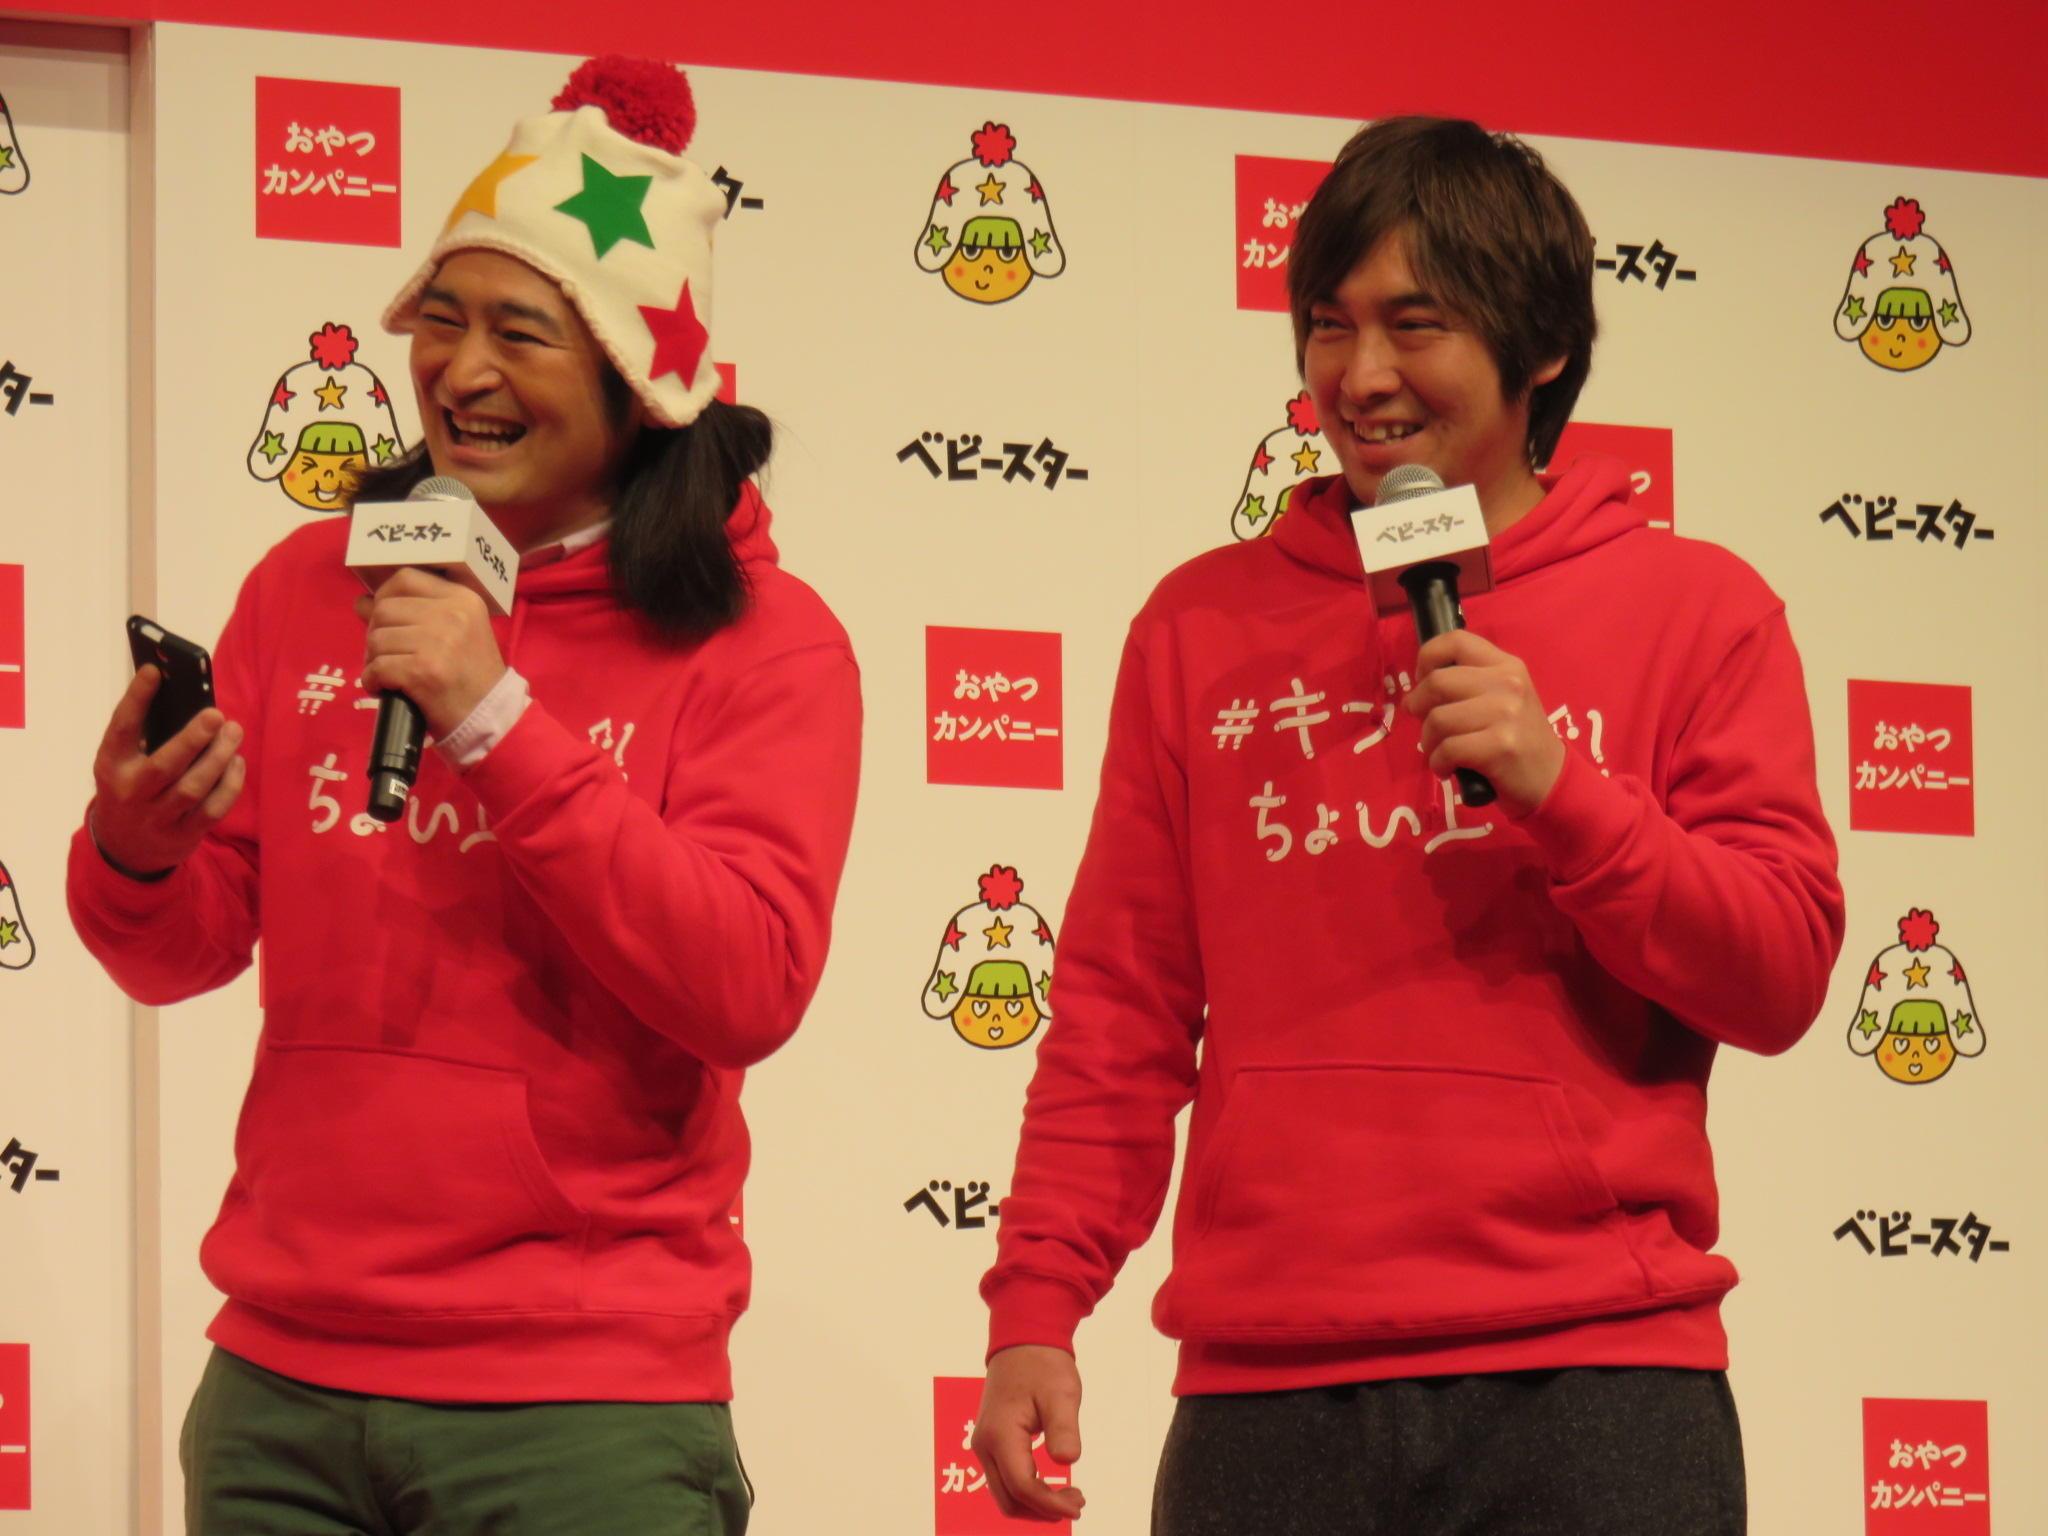 http://news.yoshimoto.co.jp/20170131190322-1bdad1cc71af56027620979903cde2a1934f2125.jpg